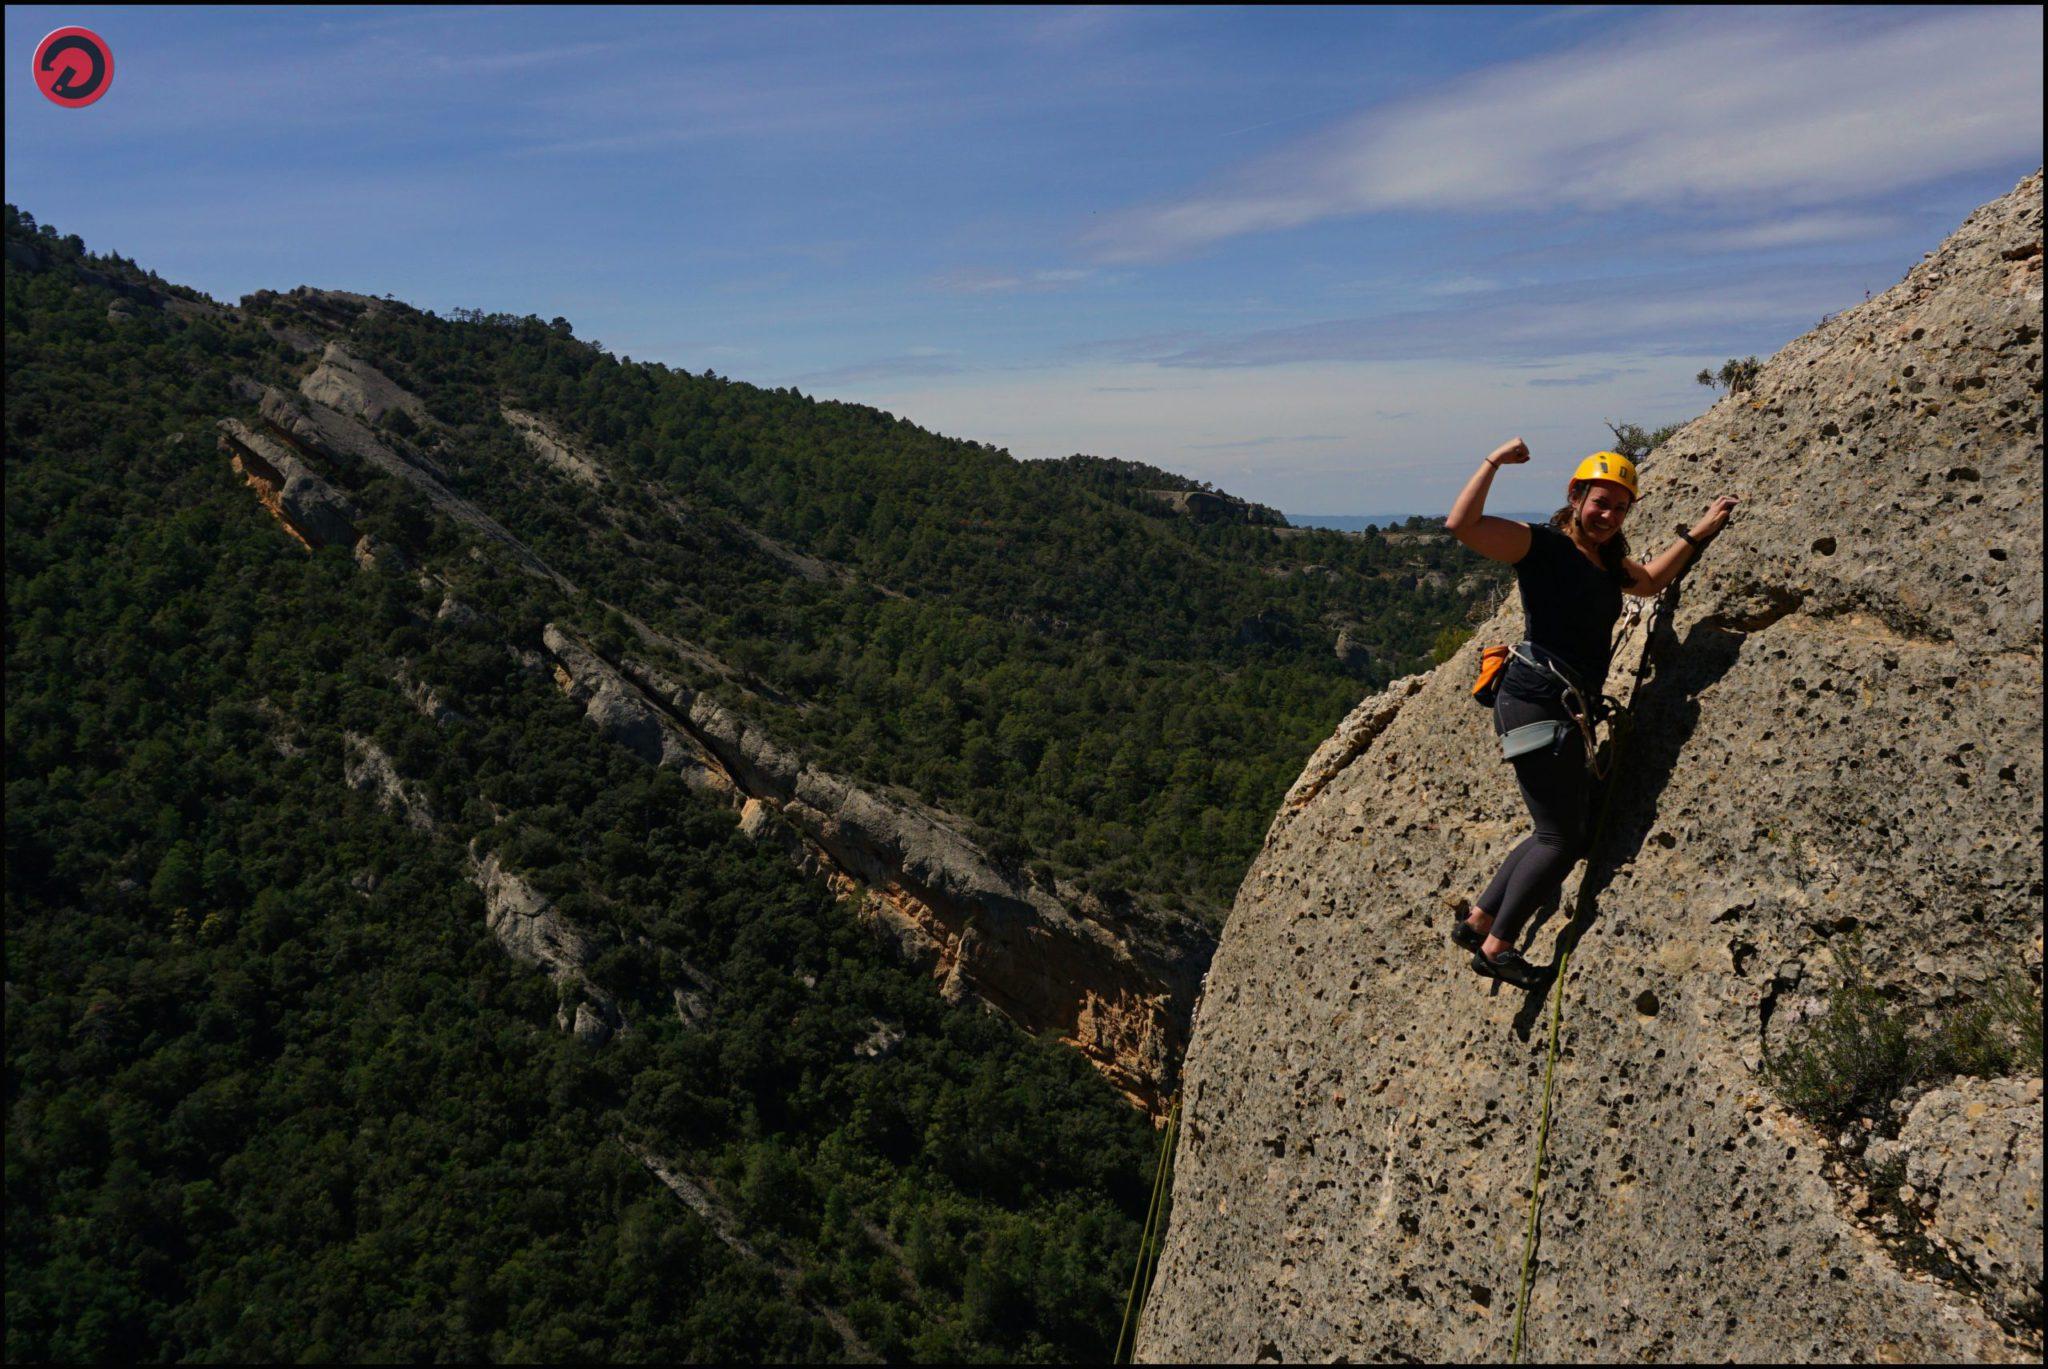 Christmas climbing camp: Spanish rock climbing holiday in Sella